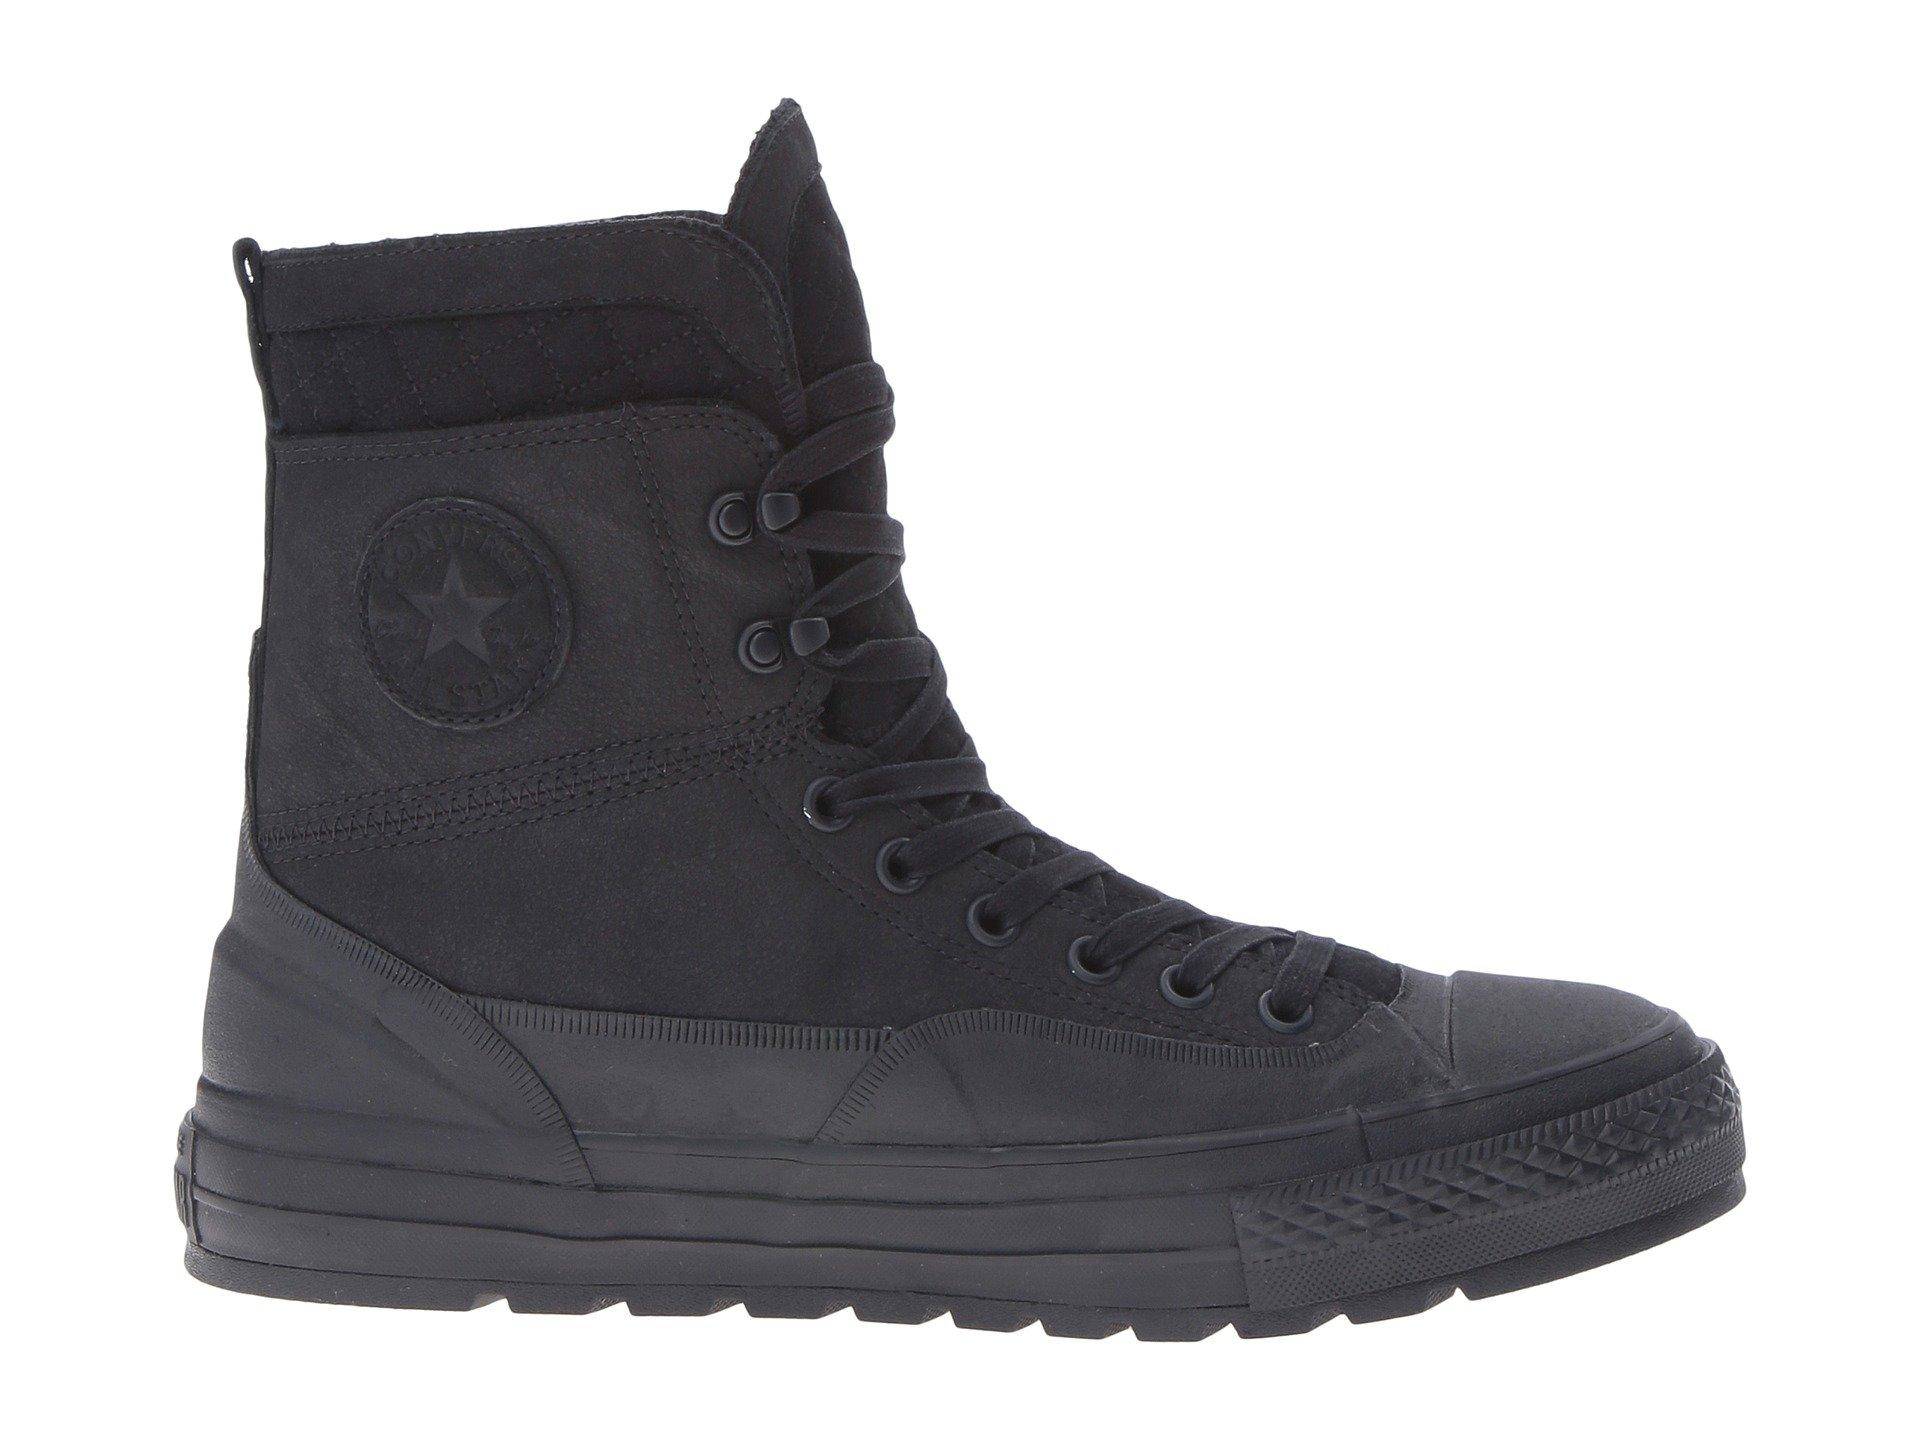 Converse Chuck Taylor® All Star® Tekoa Leather/Quilted XHi crOP0den9